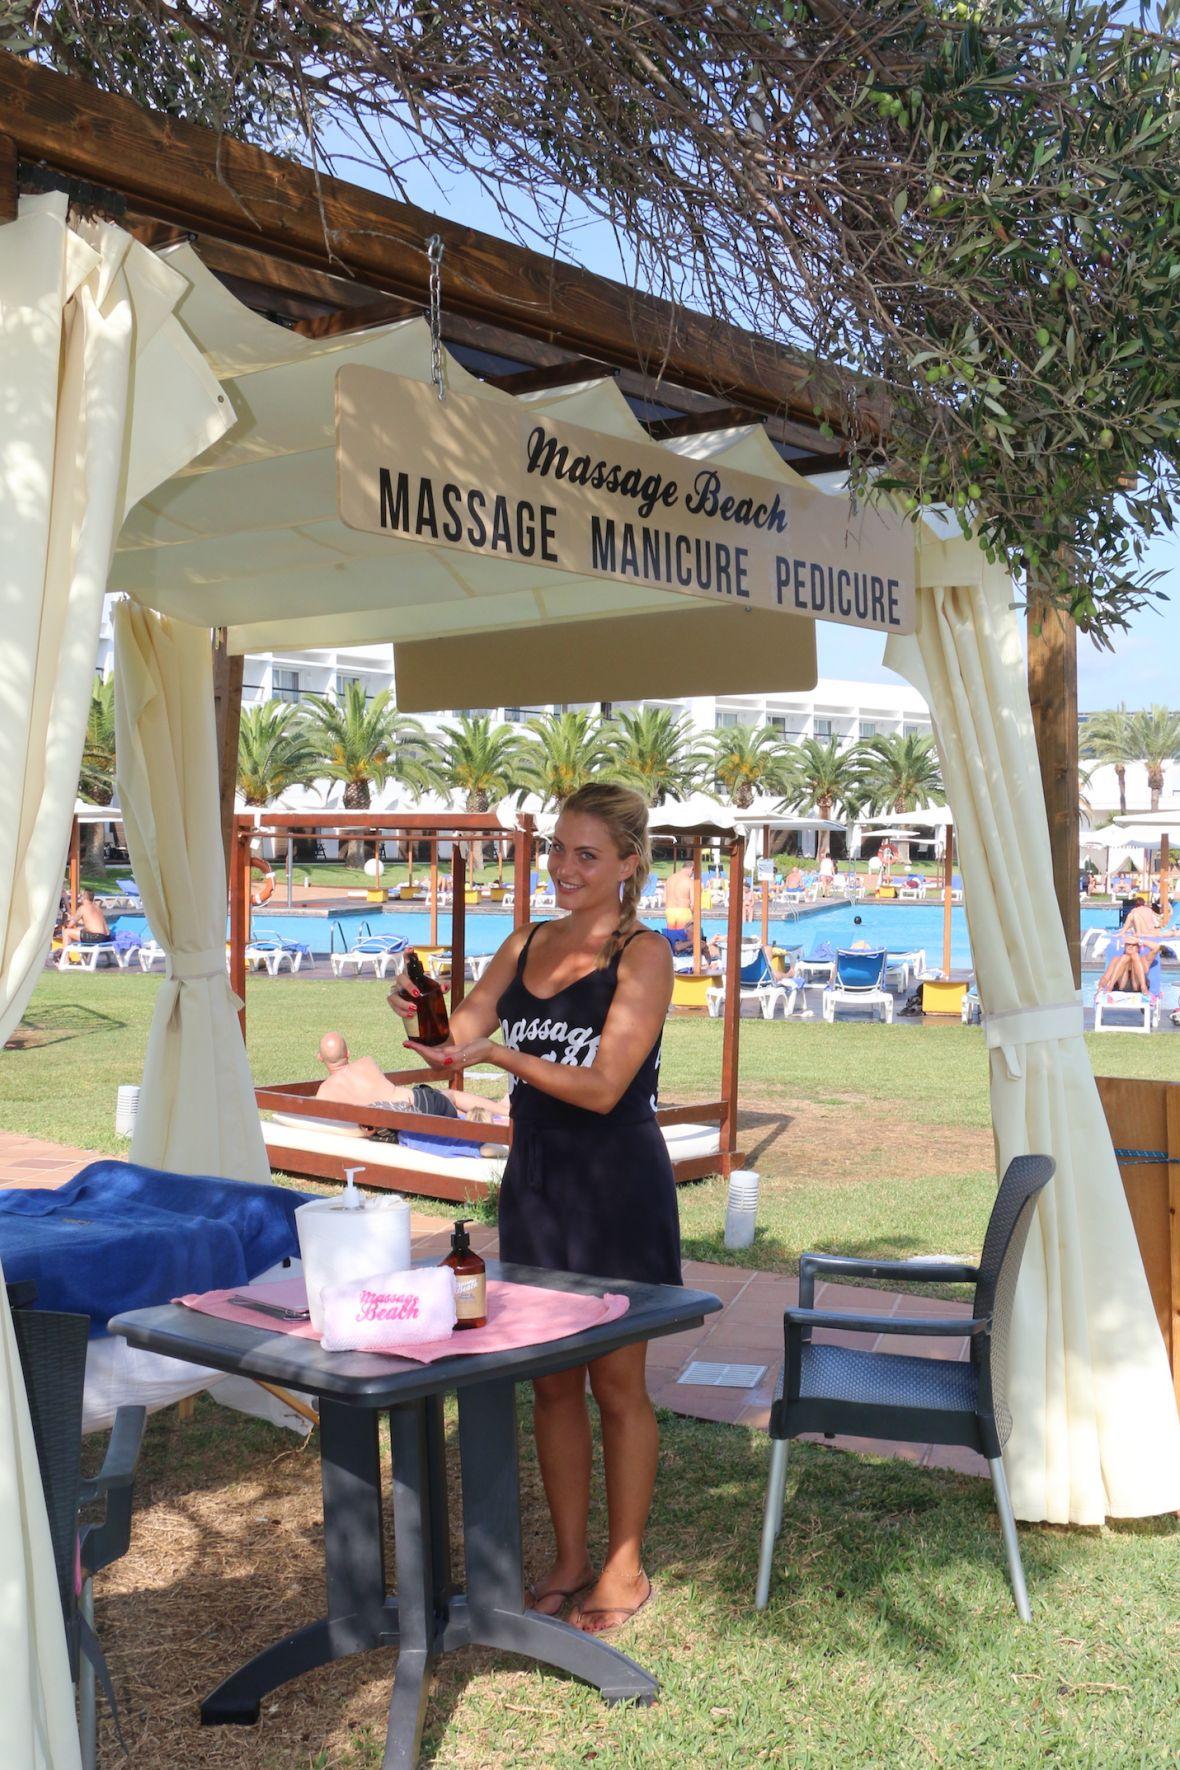 Massage and Beauty Treatment Room